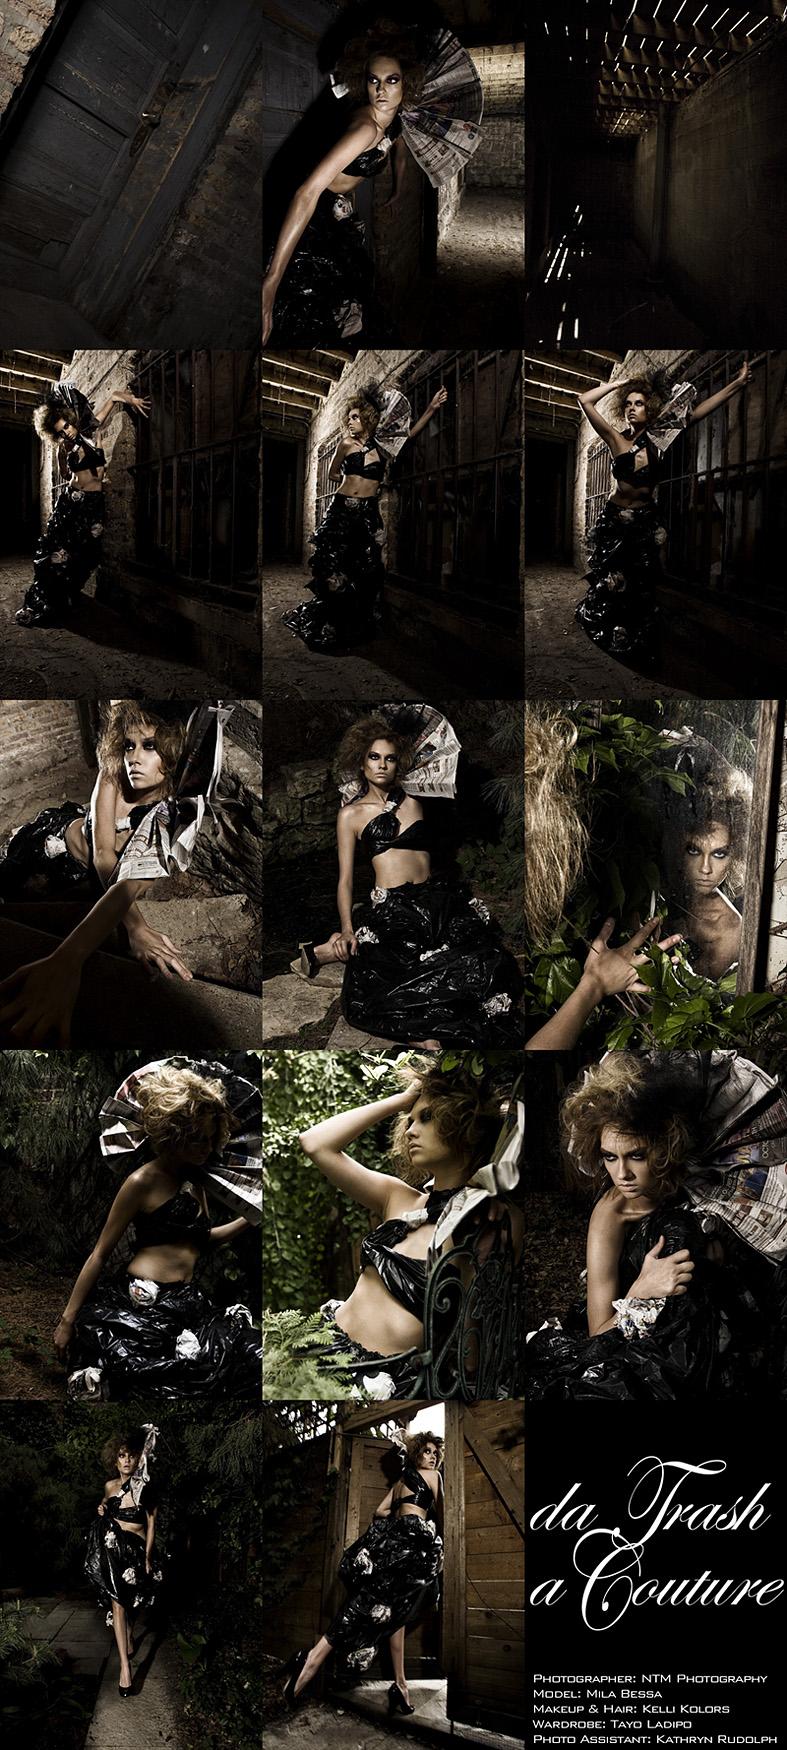 Jun 16, 2008 NTM Photography Da Trash A Couture